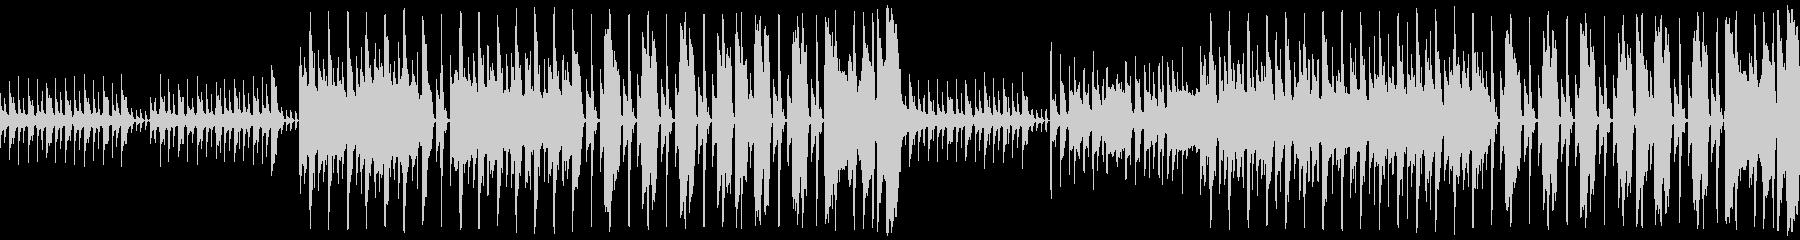 Simple riffs and rocks like exploring's unreproduced waveform